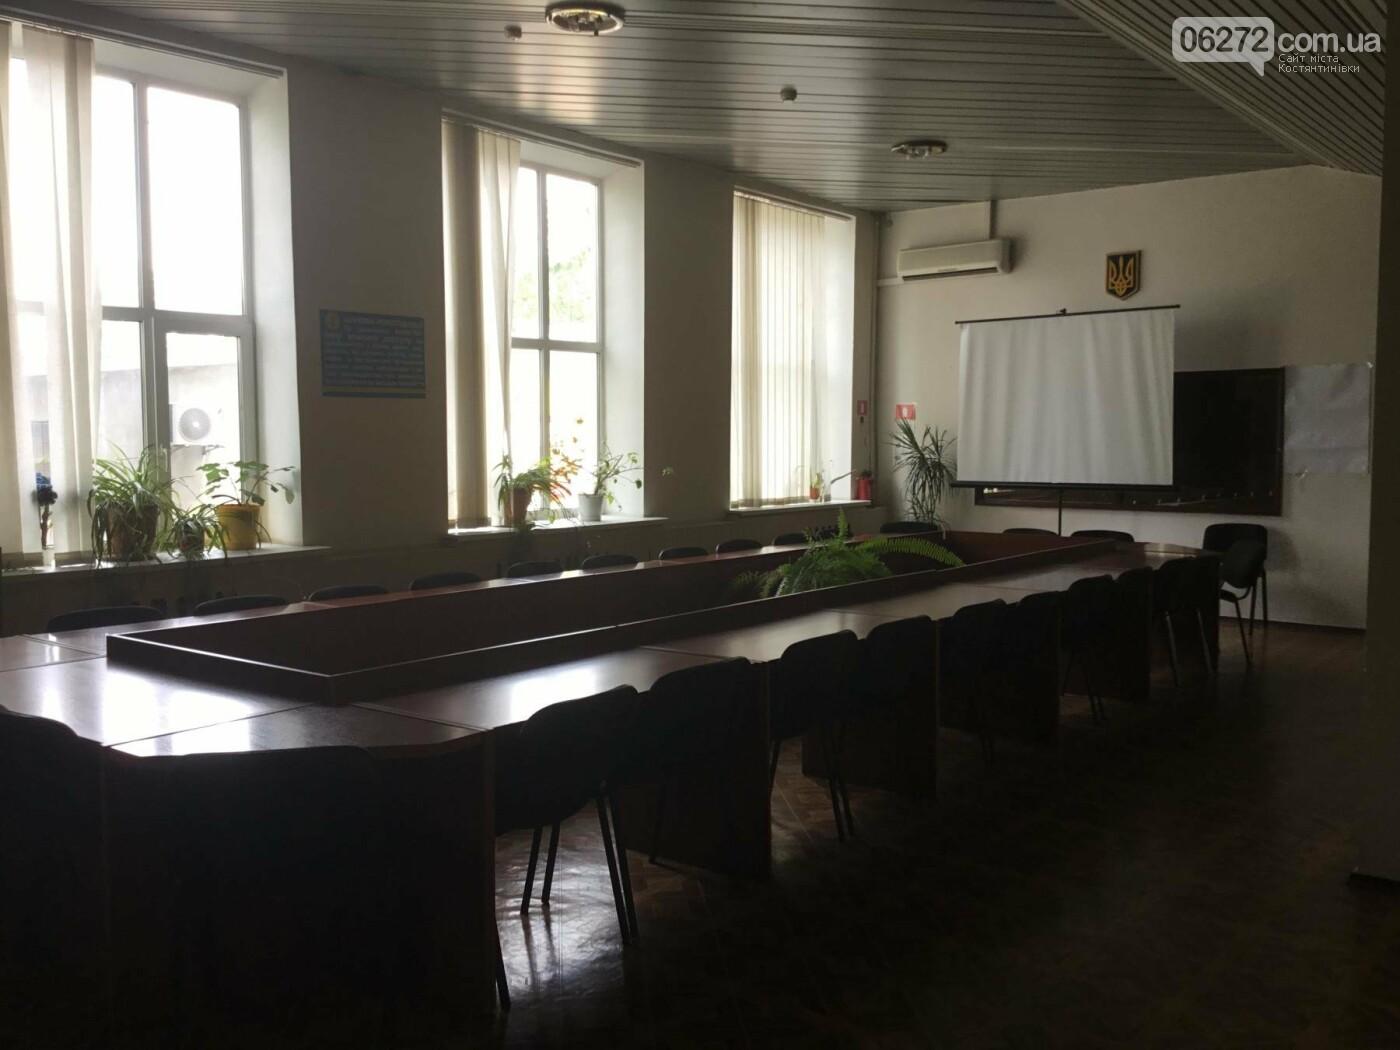 Константиновский центр занятости помогает в трудоустройстве бойцам АТО, фото-6